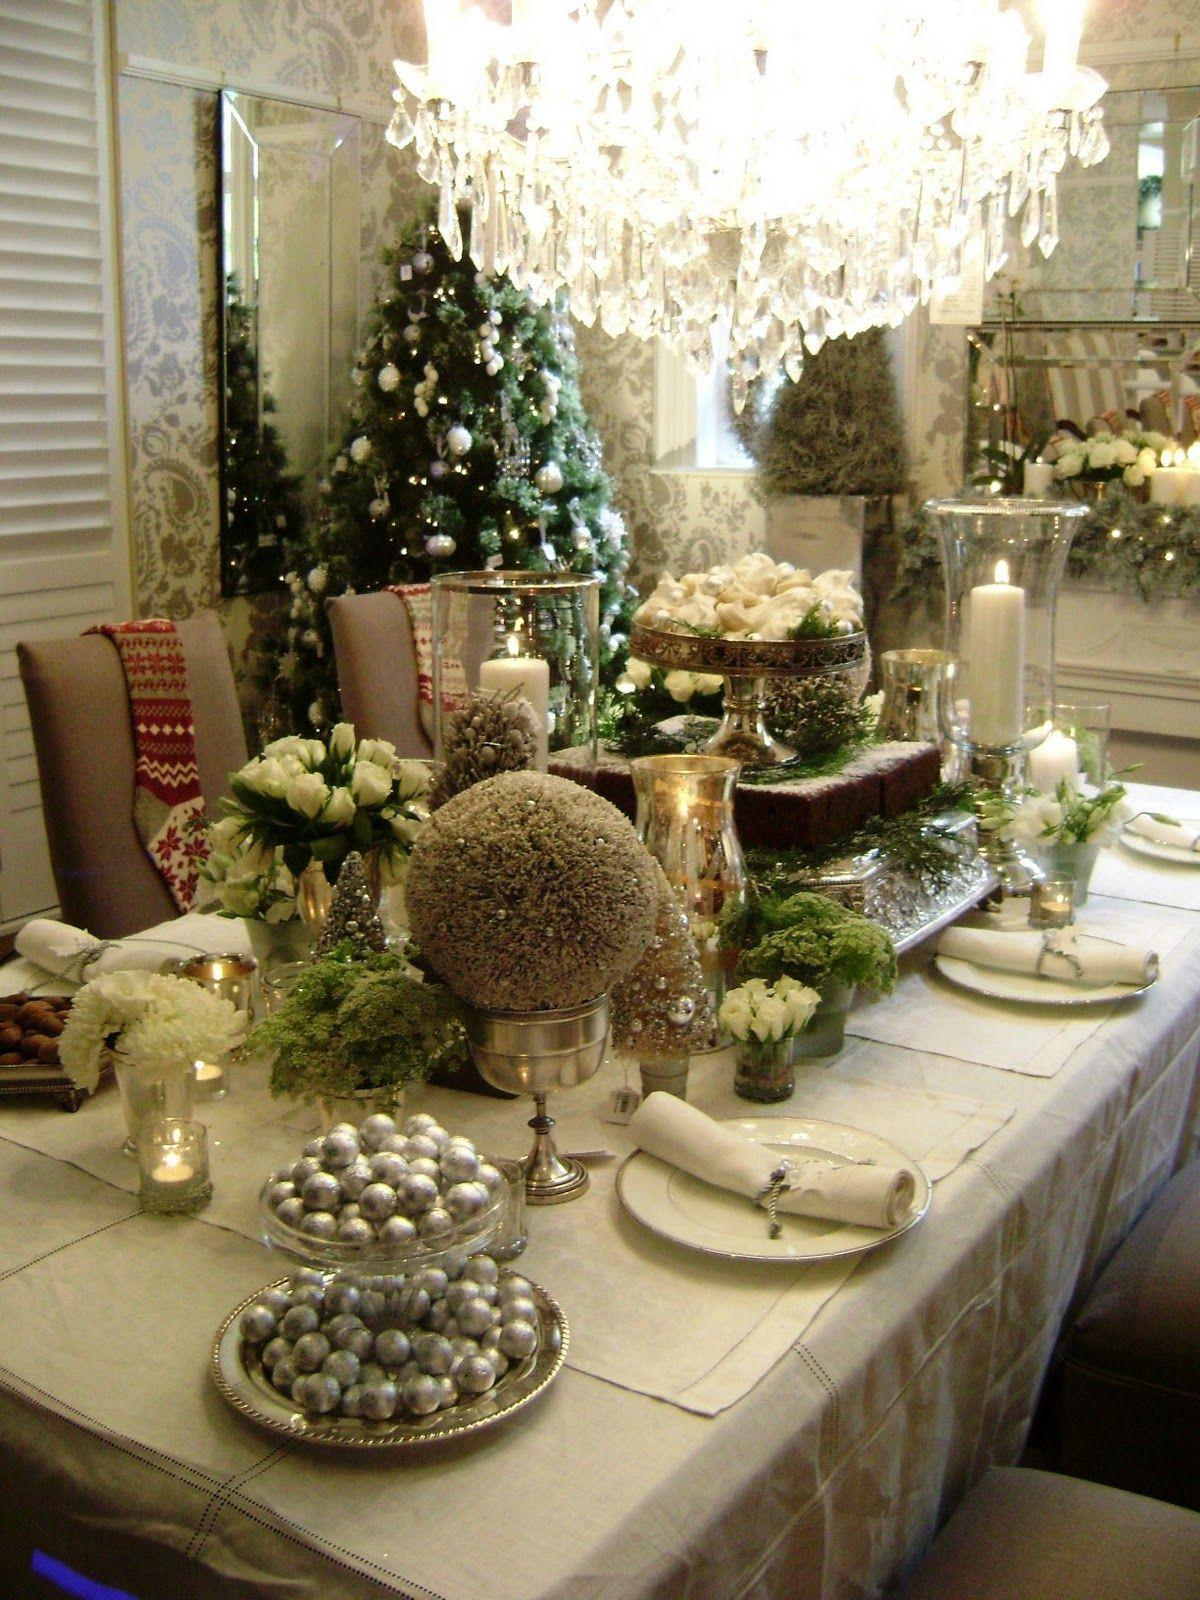 Elegant Christmas Table scape